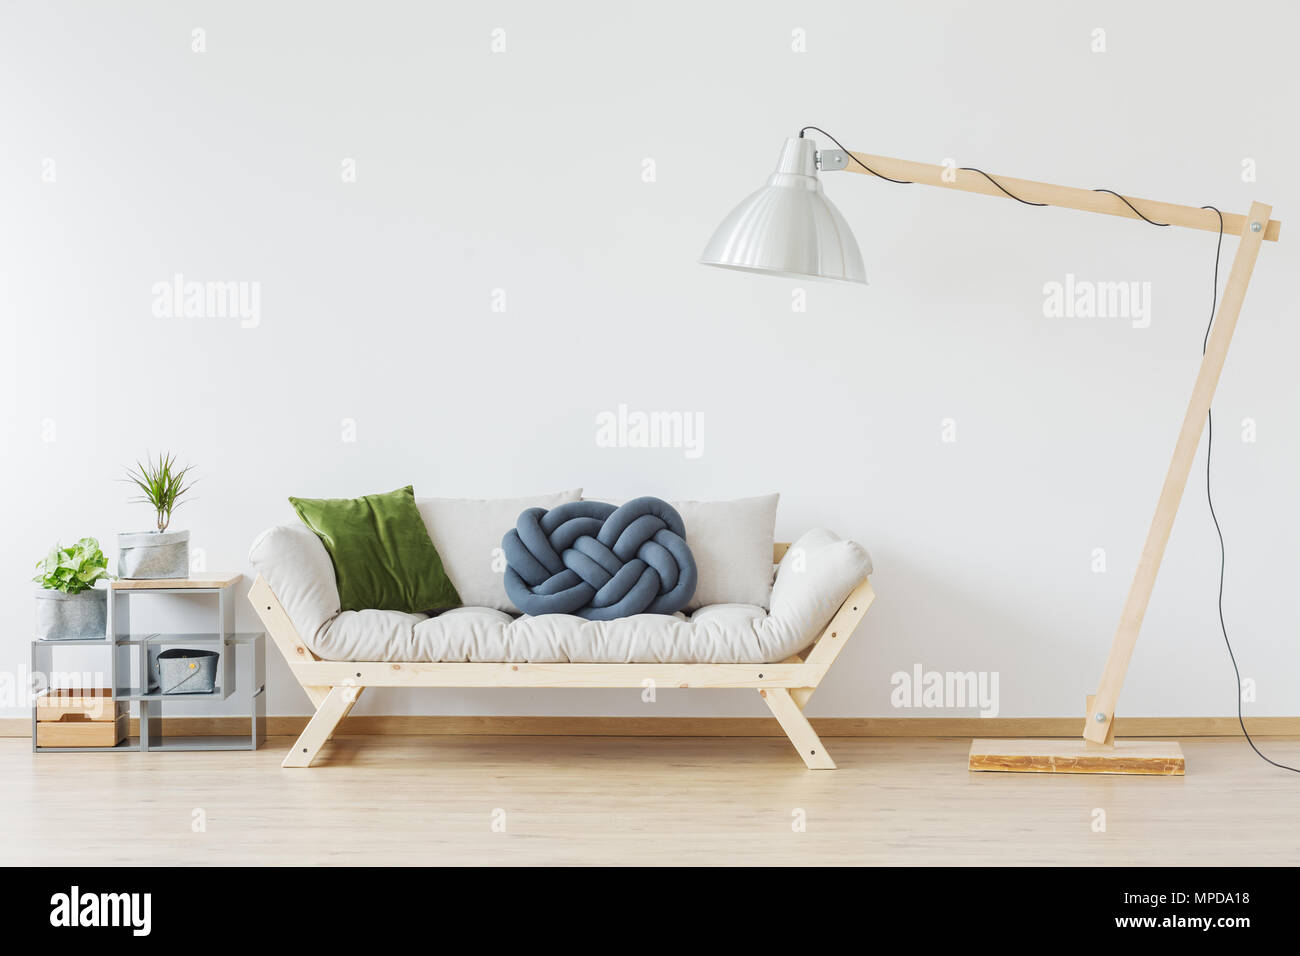 https www alamyimages fr elegant canape en bois moderne en appartement nordique image185919364 html